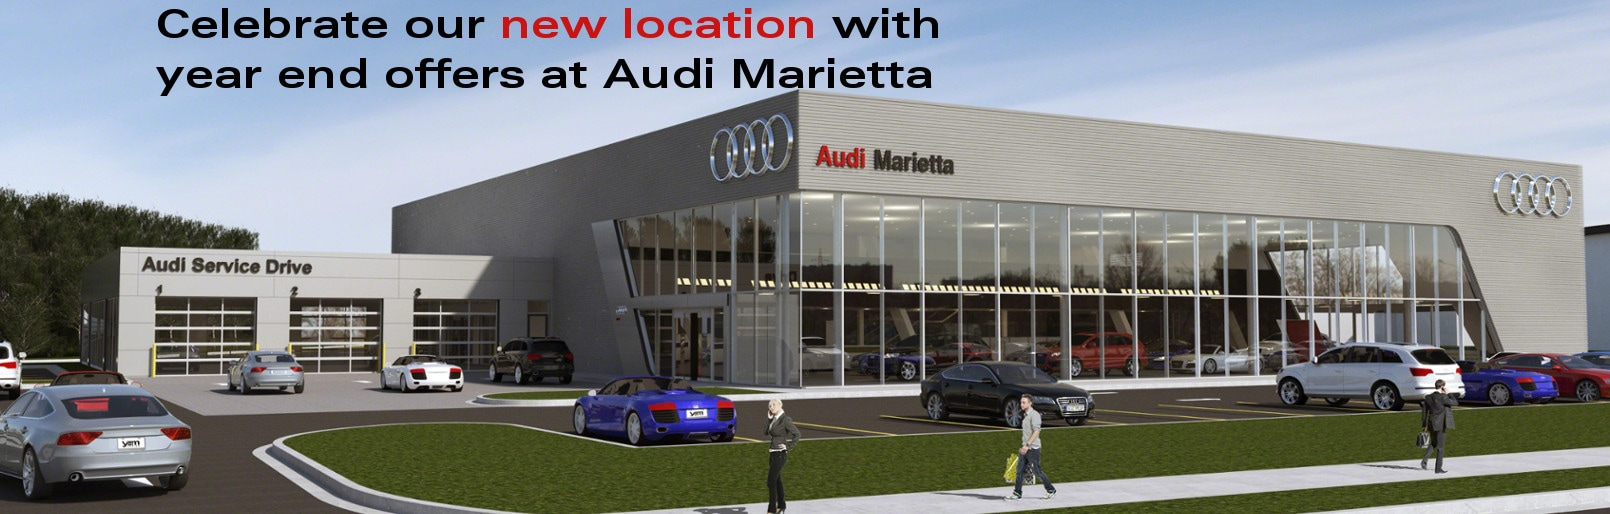 jim ellis audi marietta new audi dealership in marietta ga 30060. Cars Review. Best American Auto & Cars Review